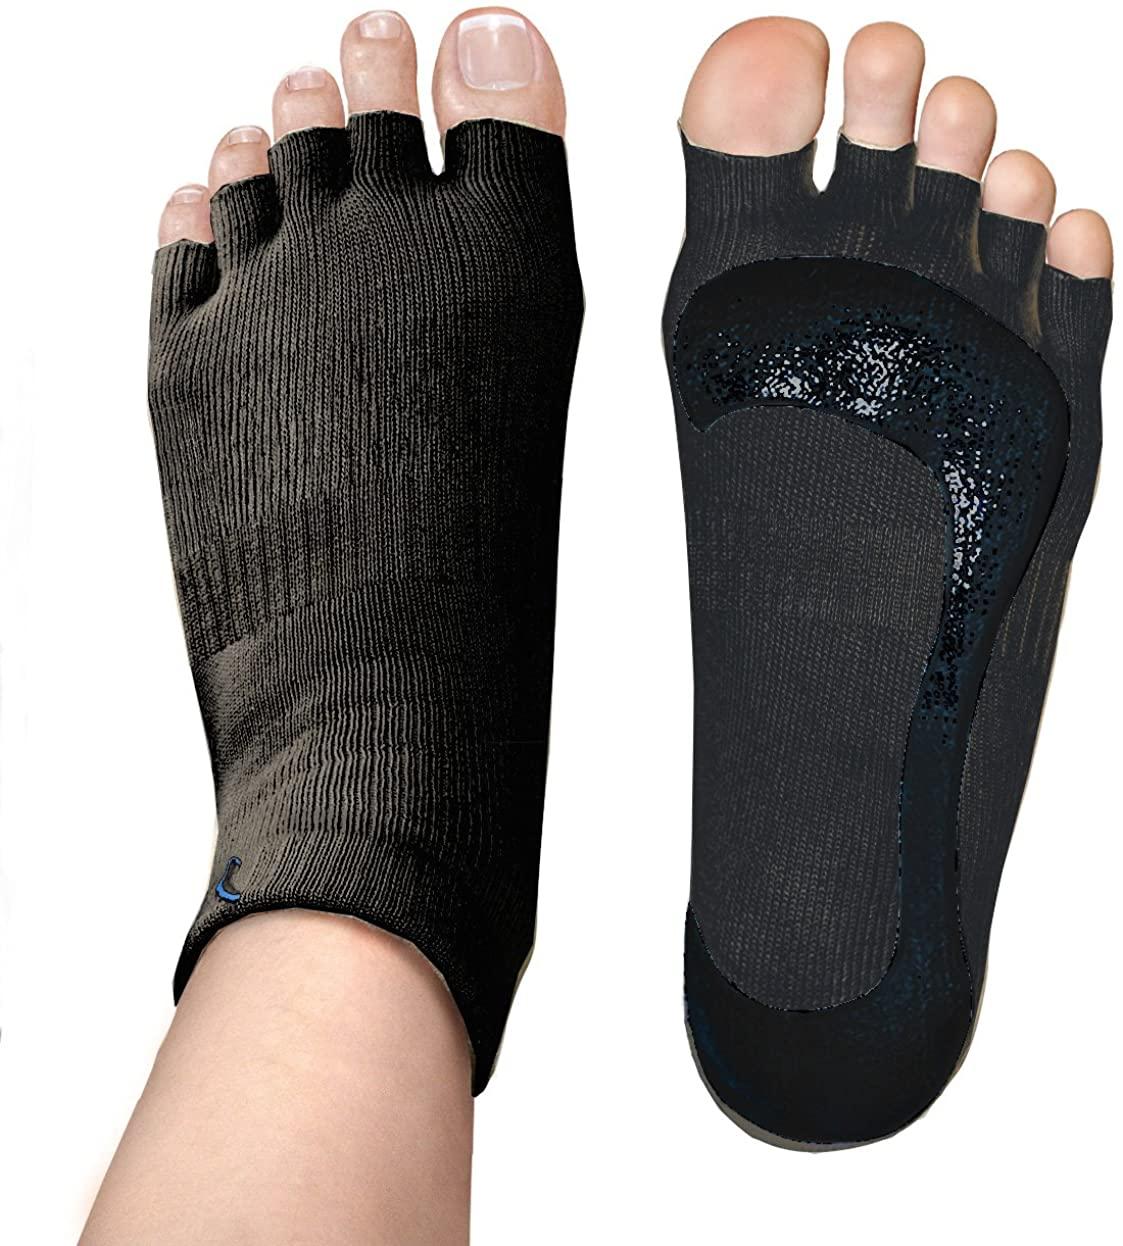 Yoga Socks in Black (1 Pair )